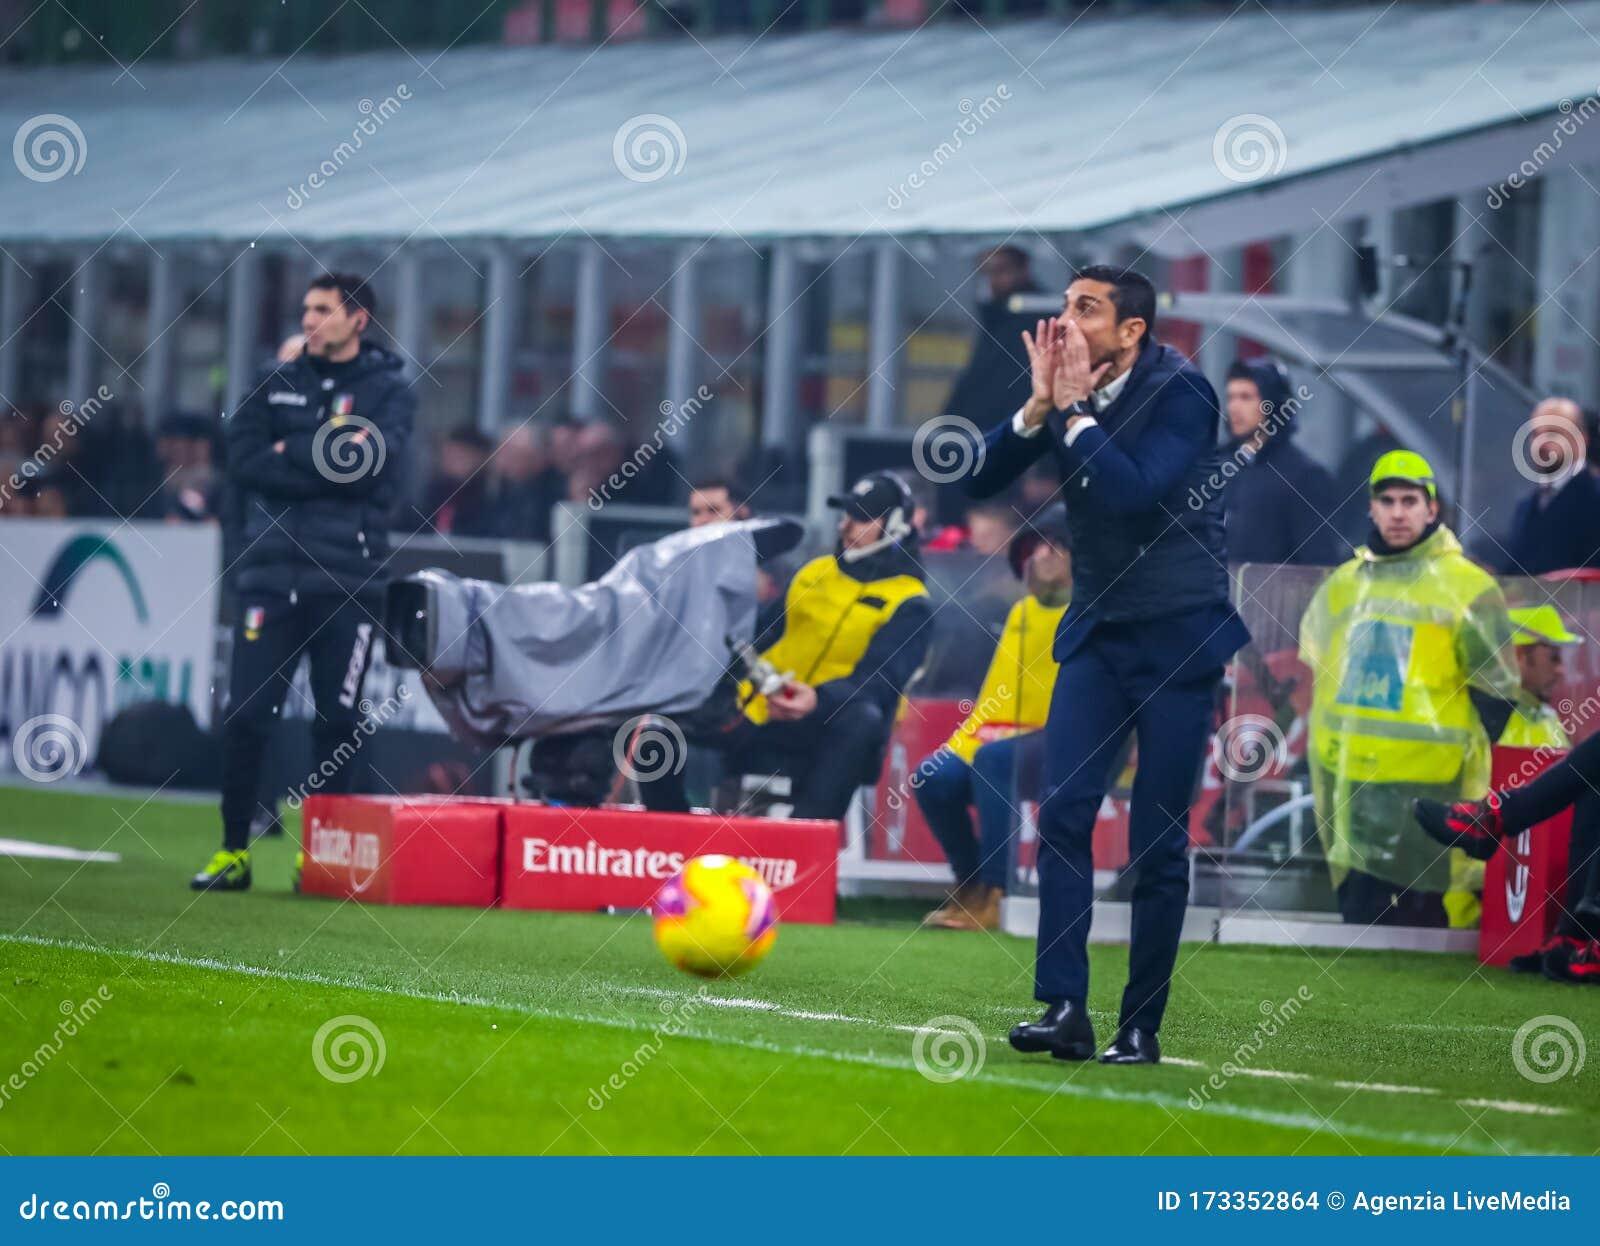 Italian Serie A Soccer Match Ac Milan Vs Torino Editorial Stock Image Image Of 201920 Milan 173352864